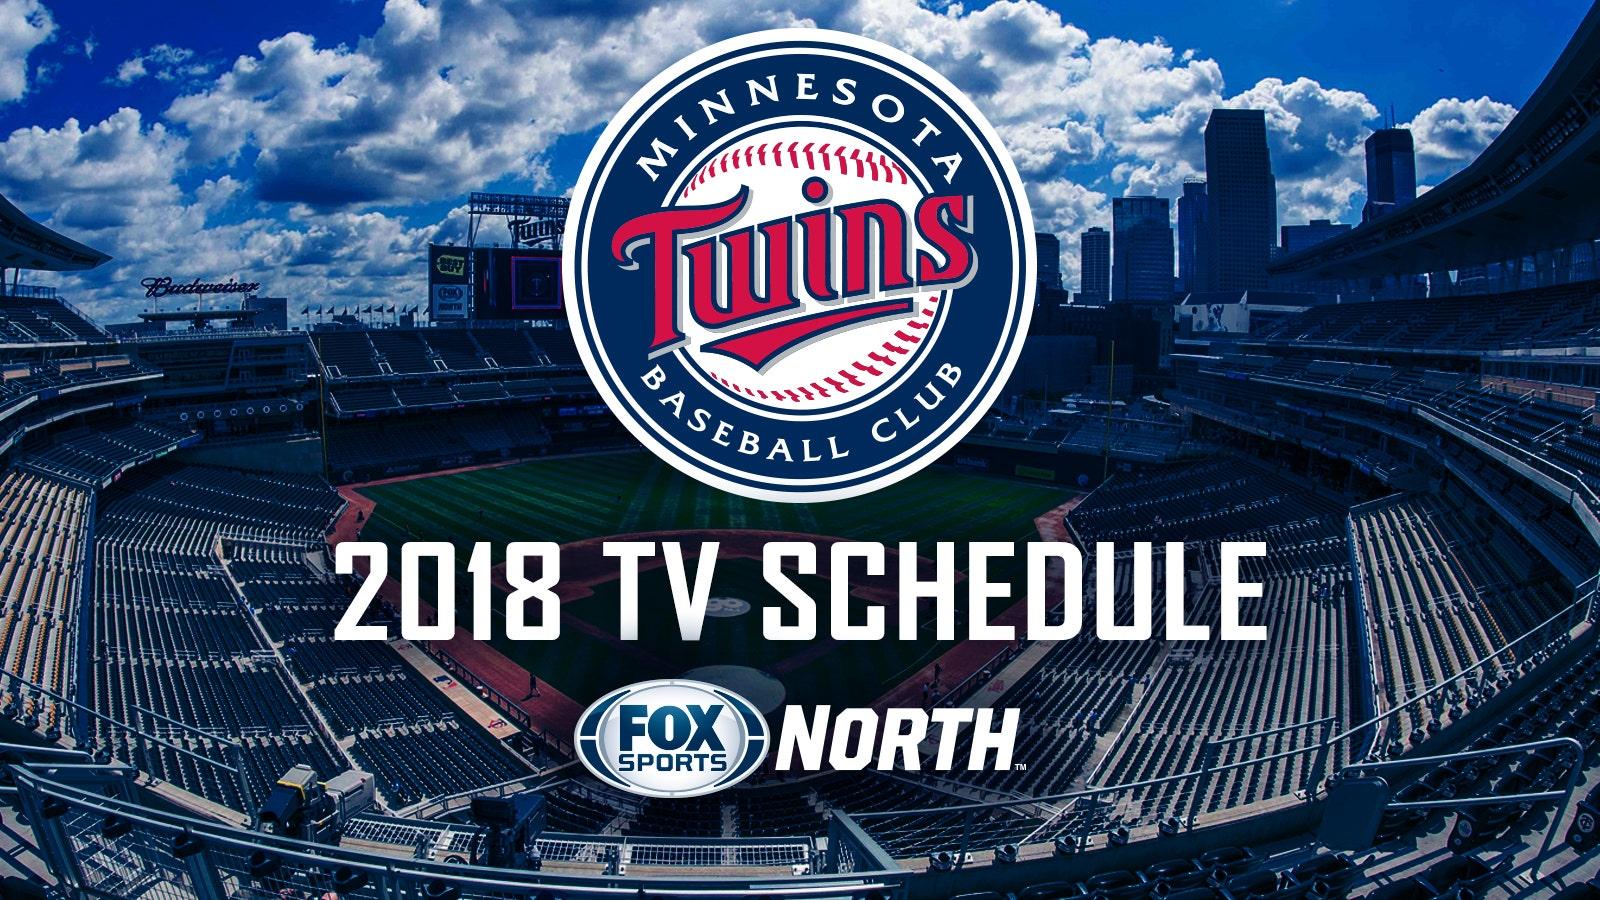 FOX Sports North, Minnesota Twins announce 2018 broadcast